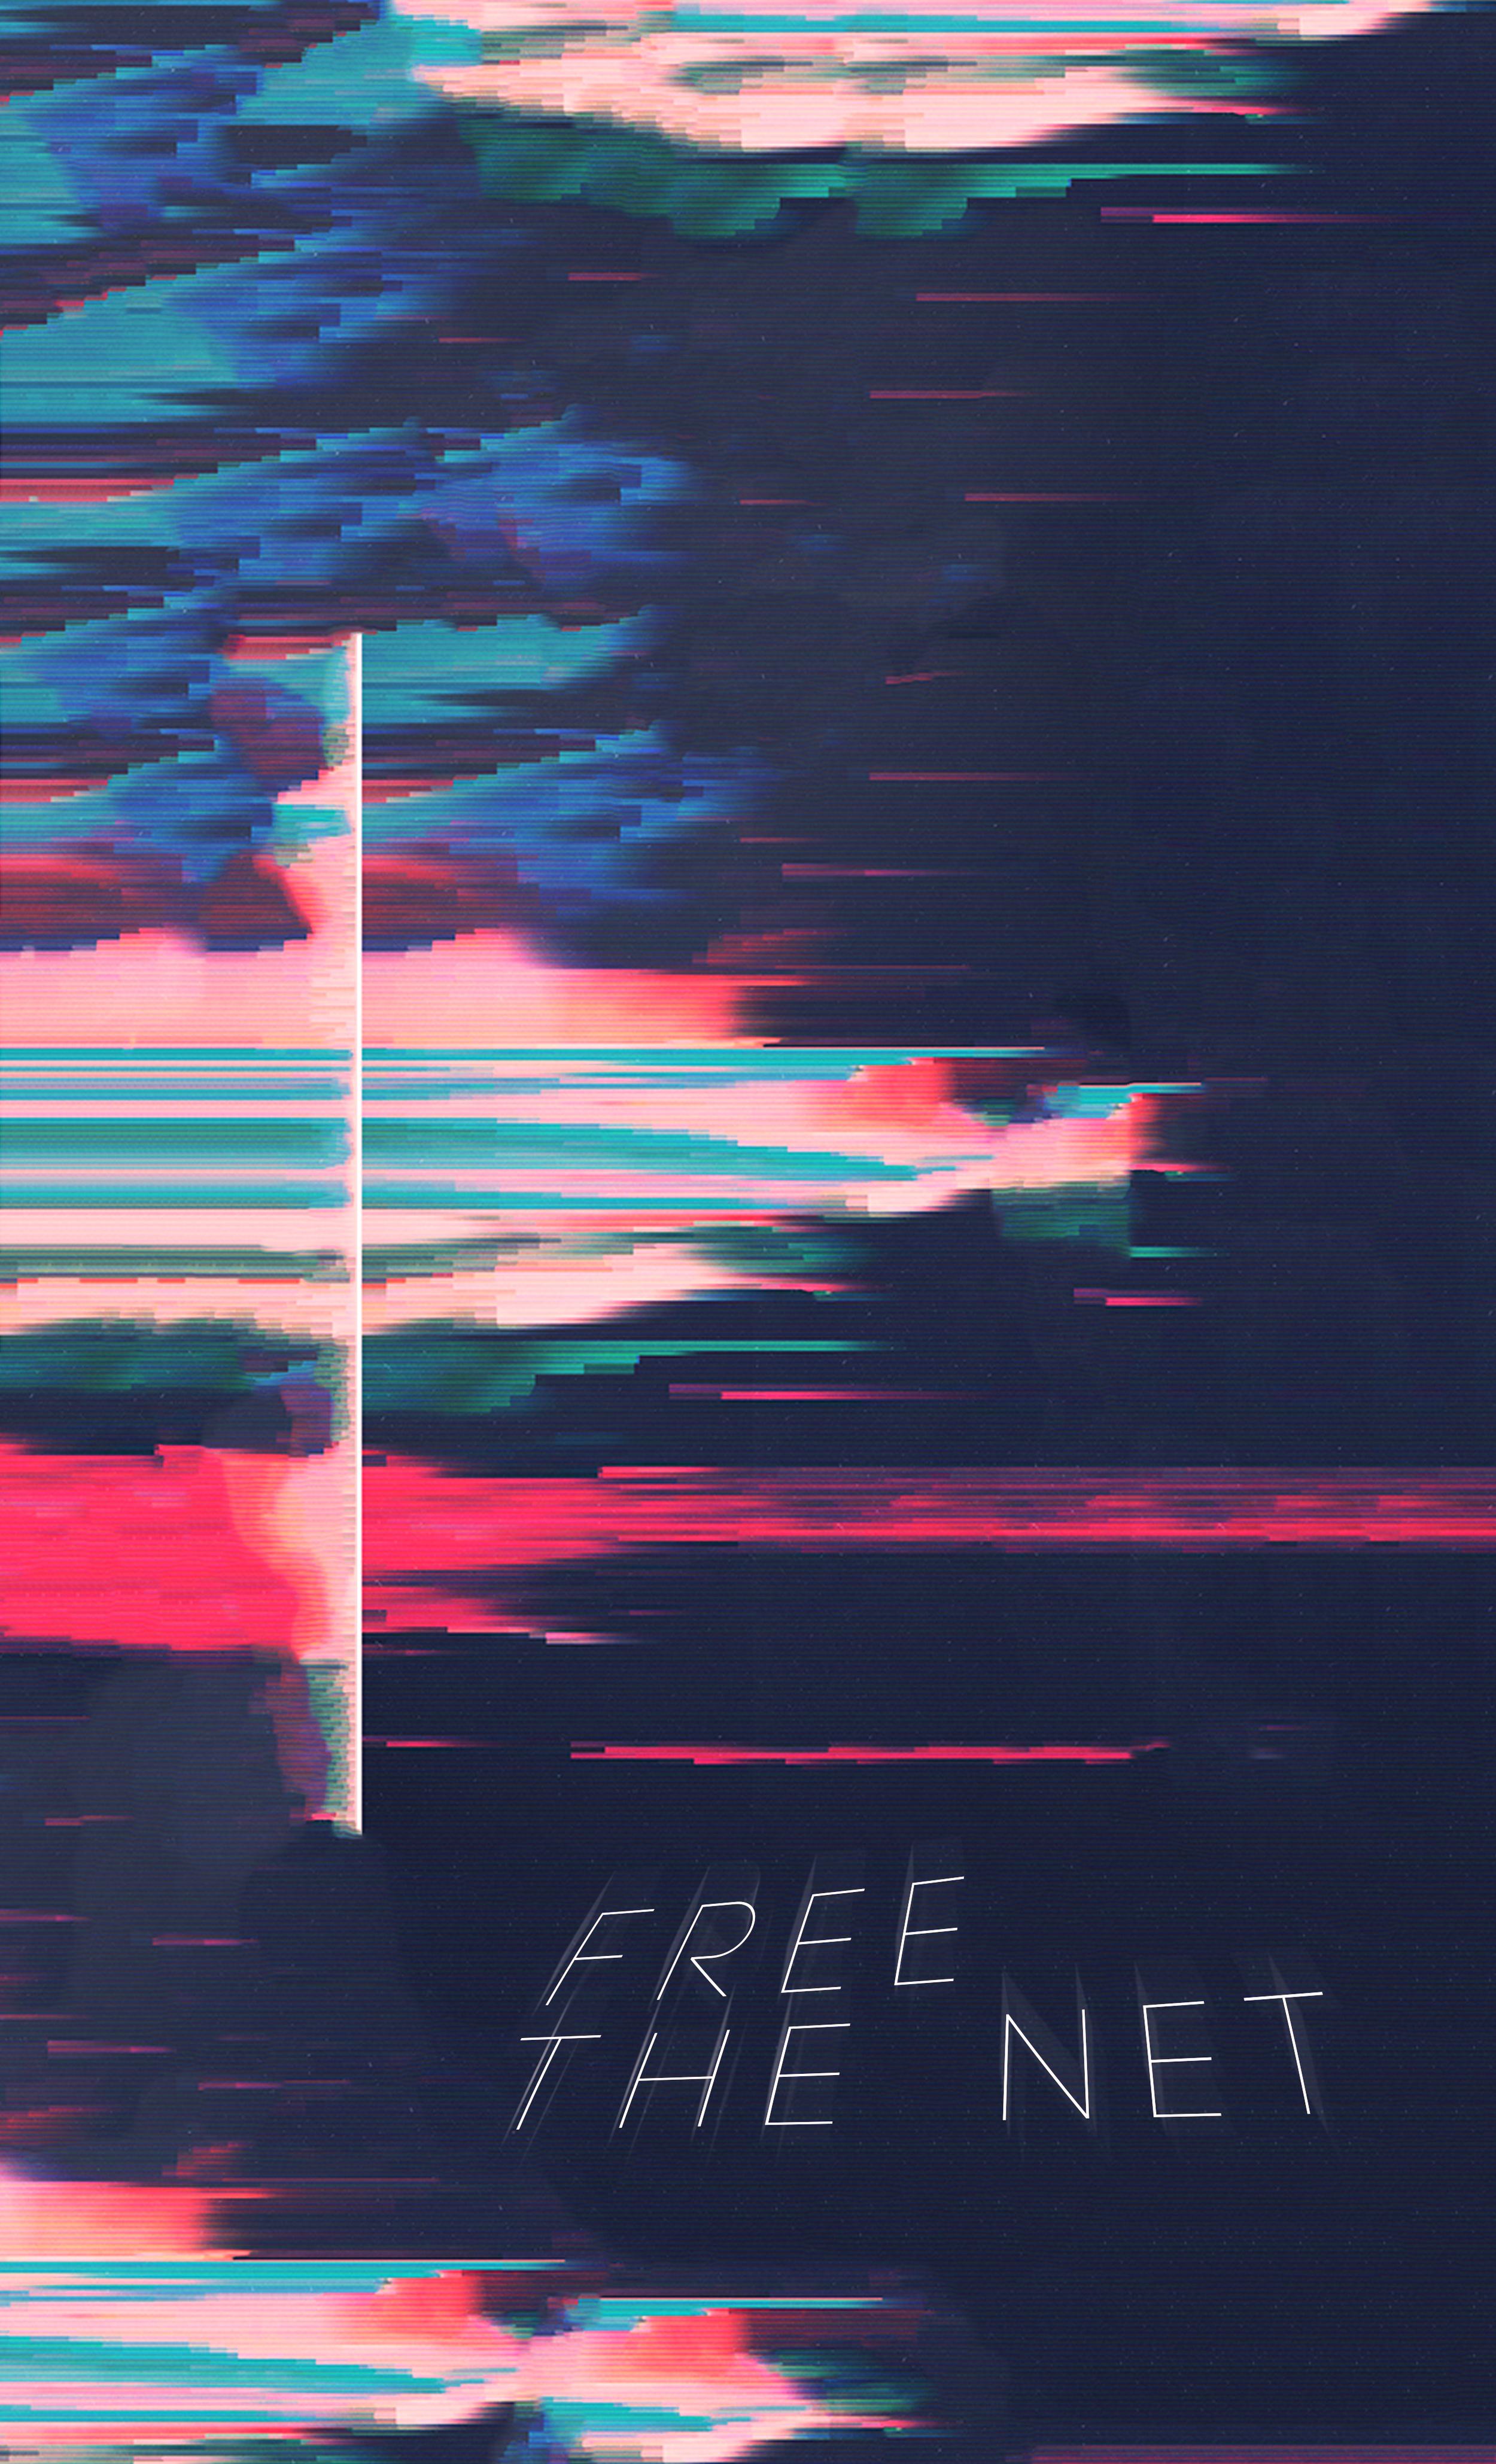 free the net.jpg